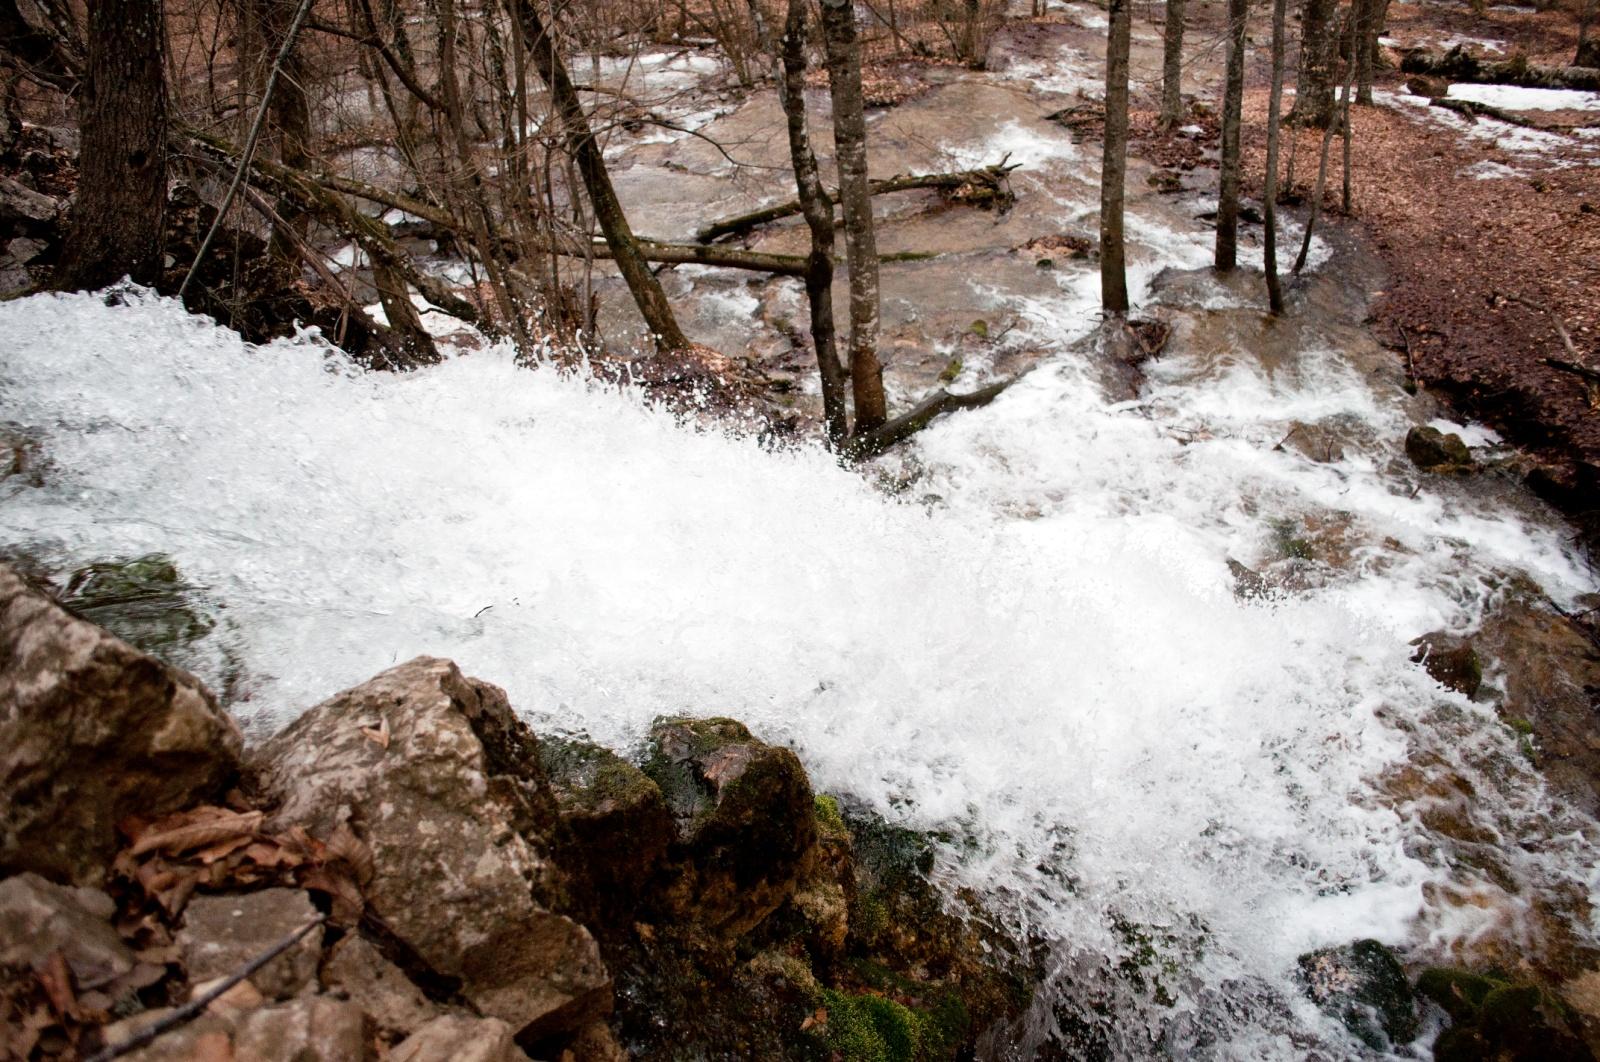 Описание: 24-26 марта 2012 (Большой каньон)\_DSC0438-Edit.jpg